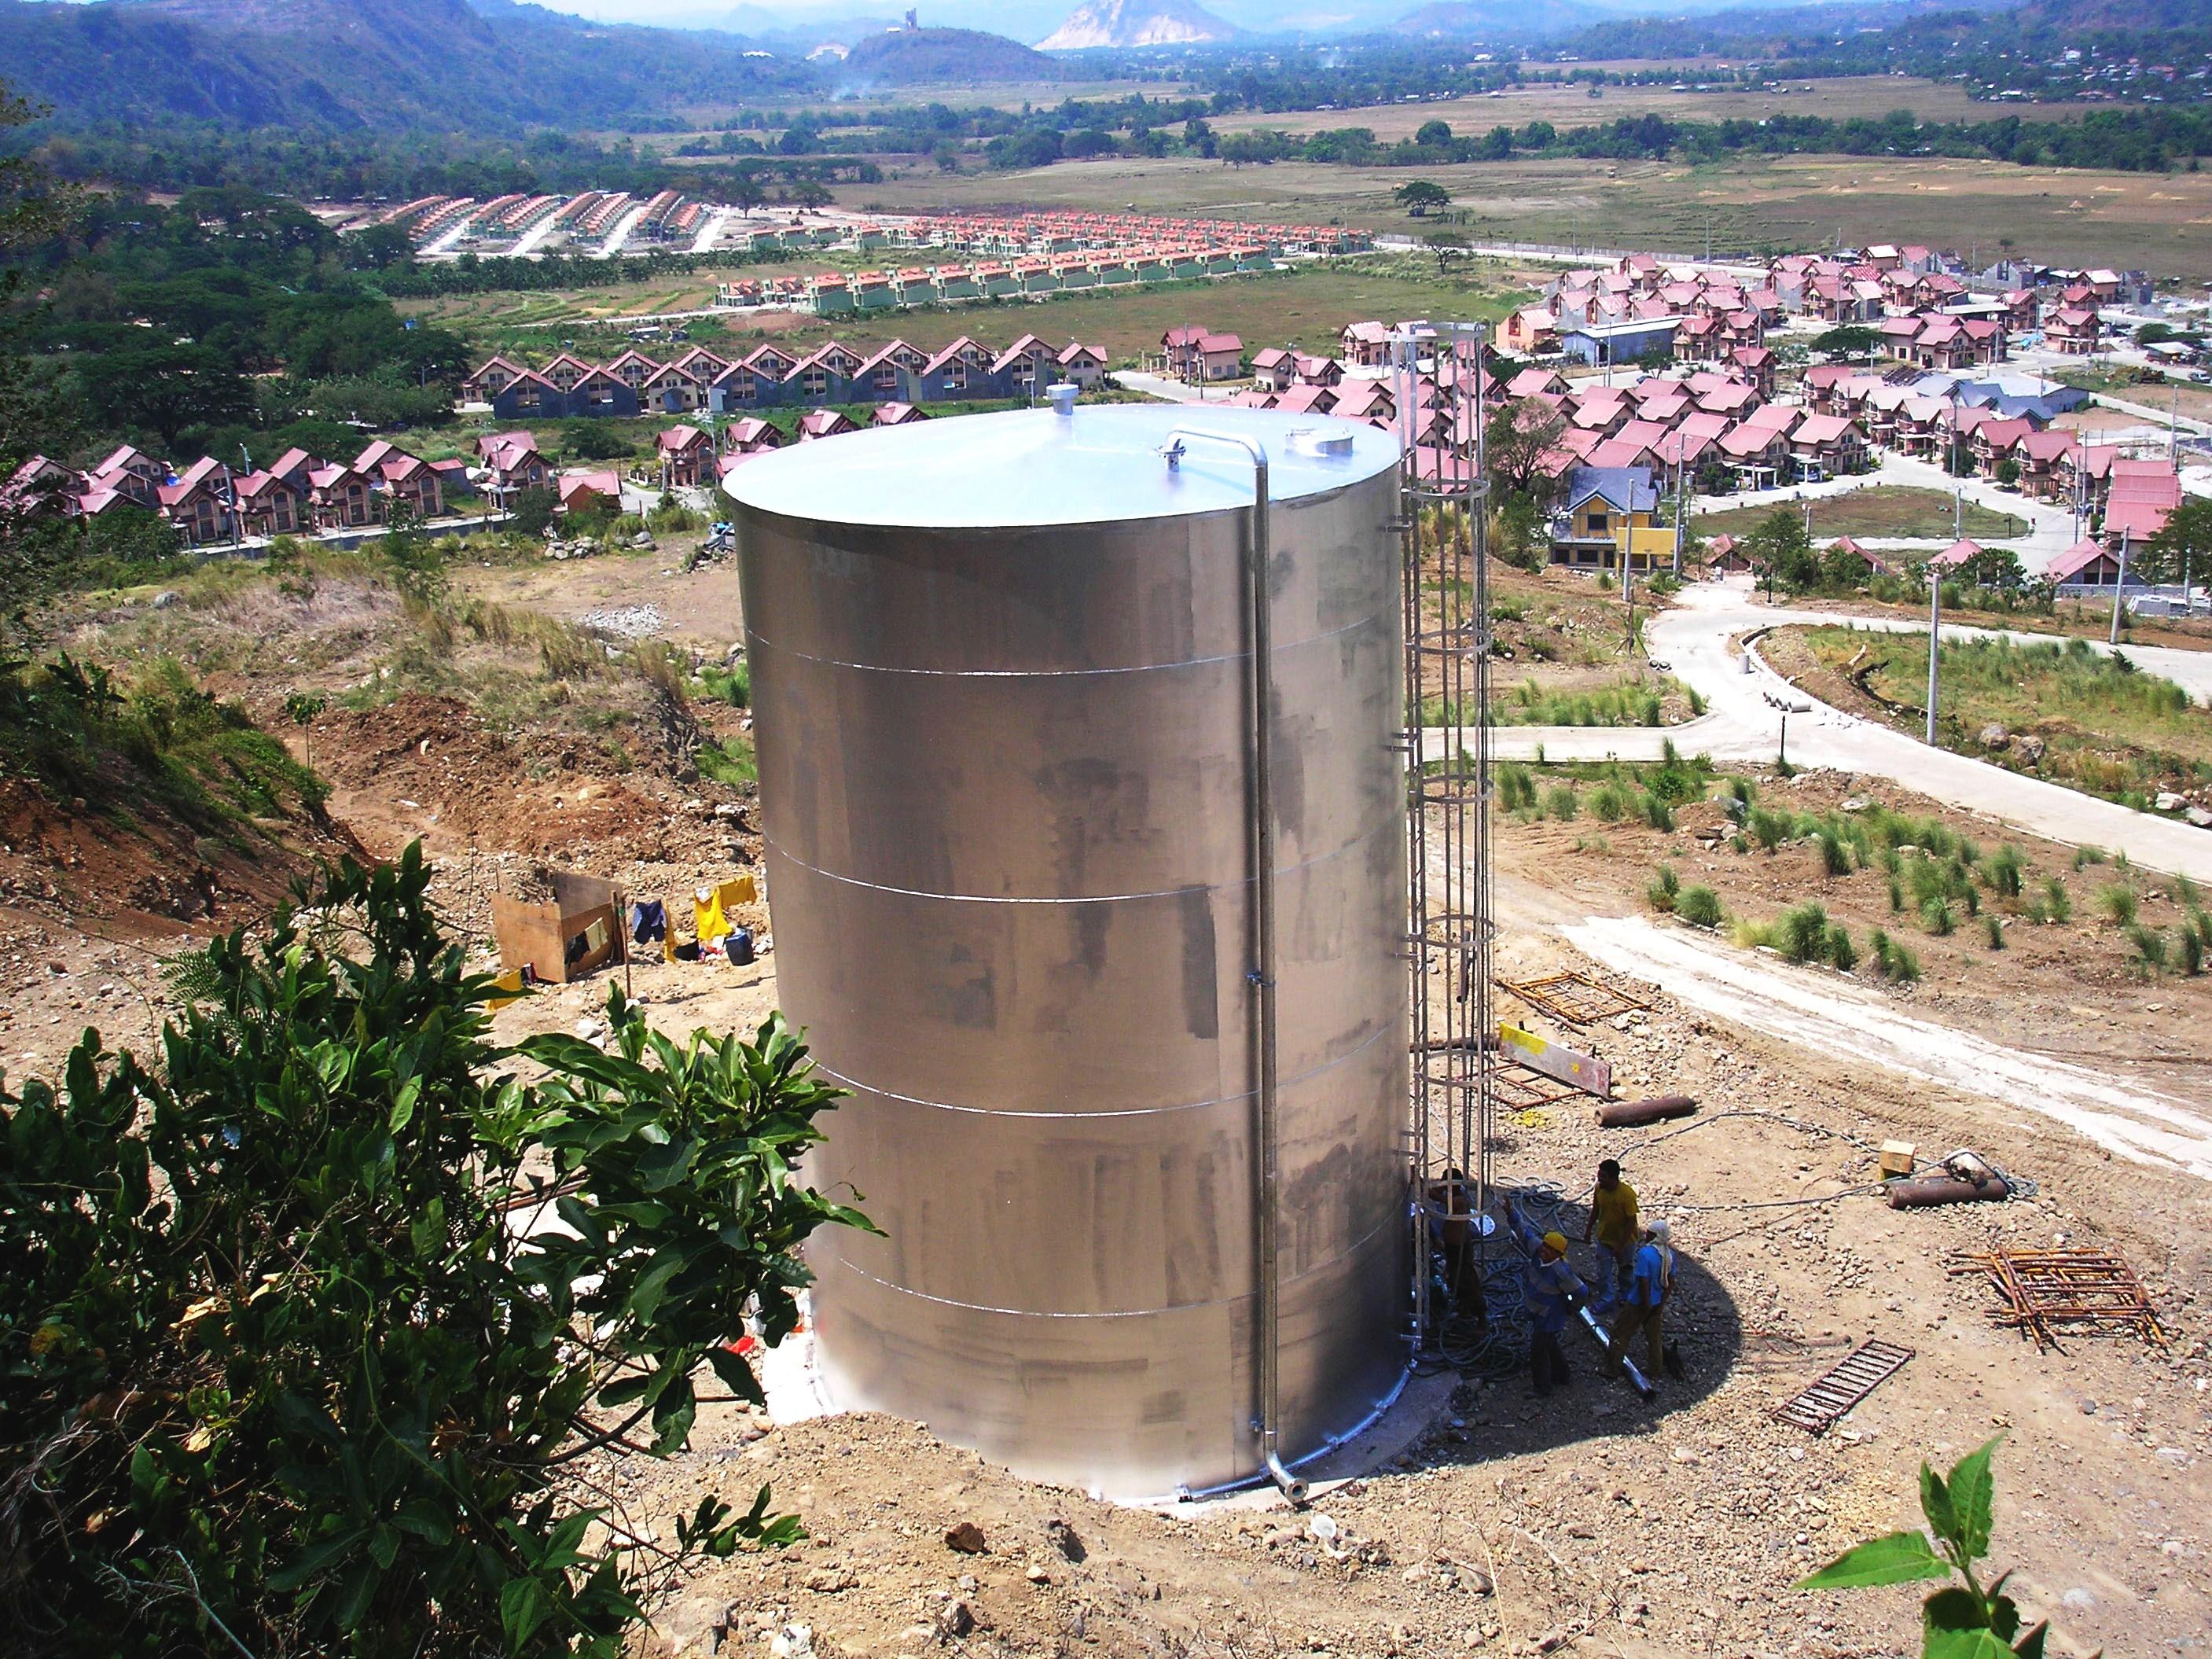 Above Ground Water Tank